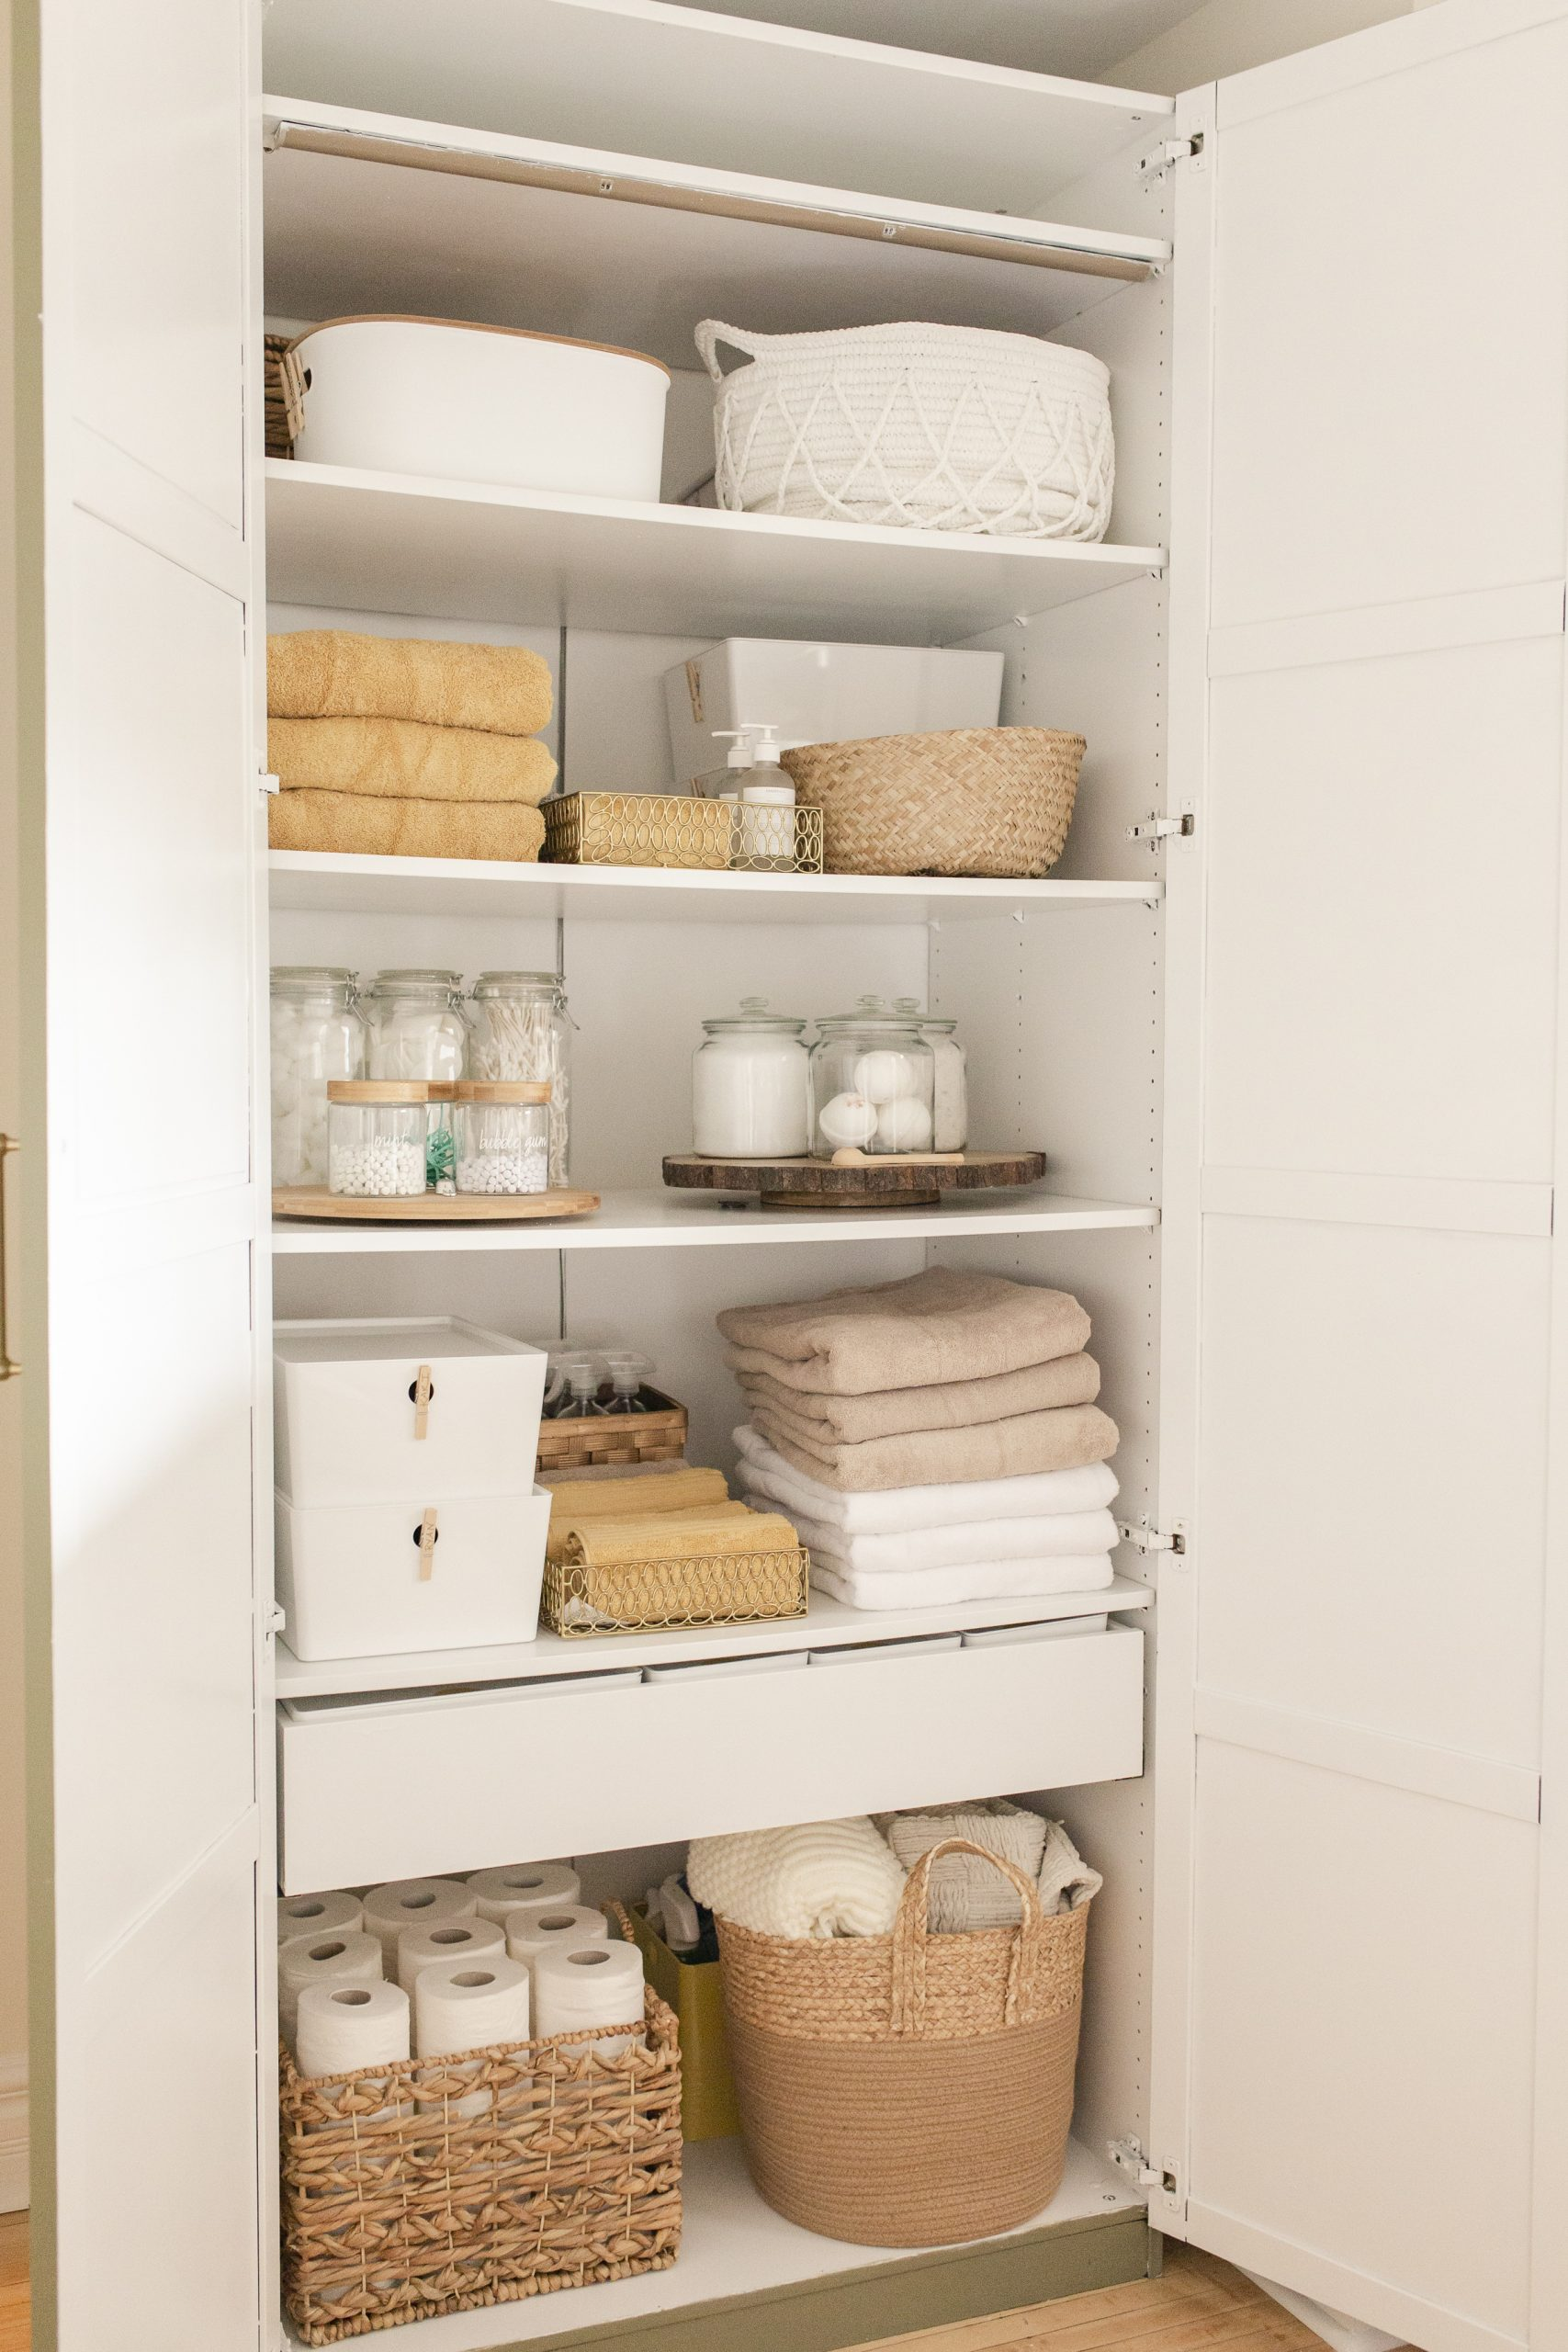 Ikea Hack: Wardrobe Turned Linen Closet